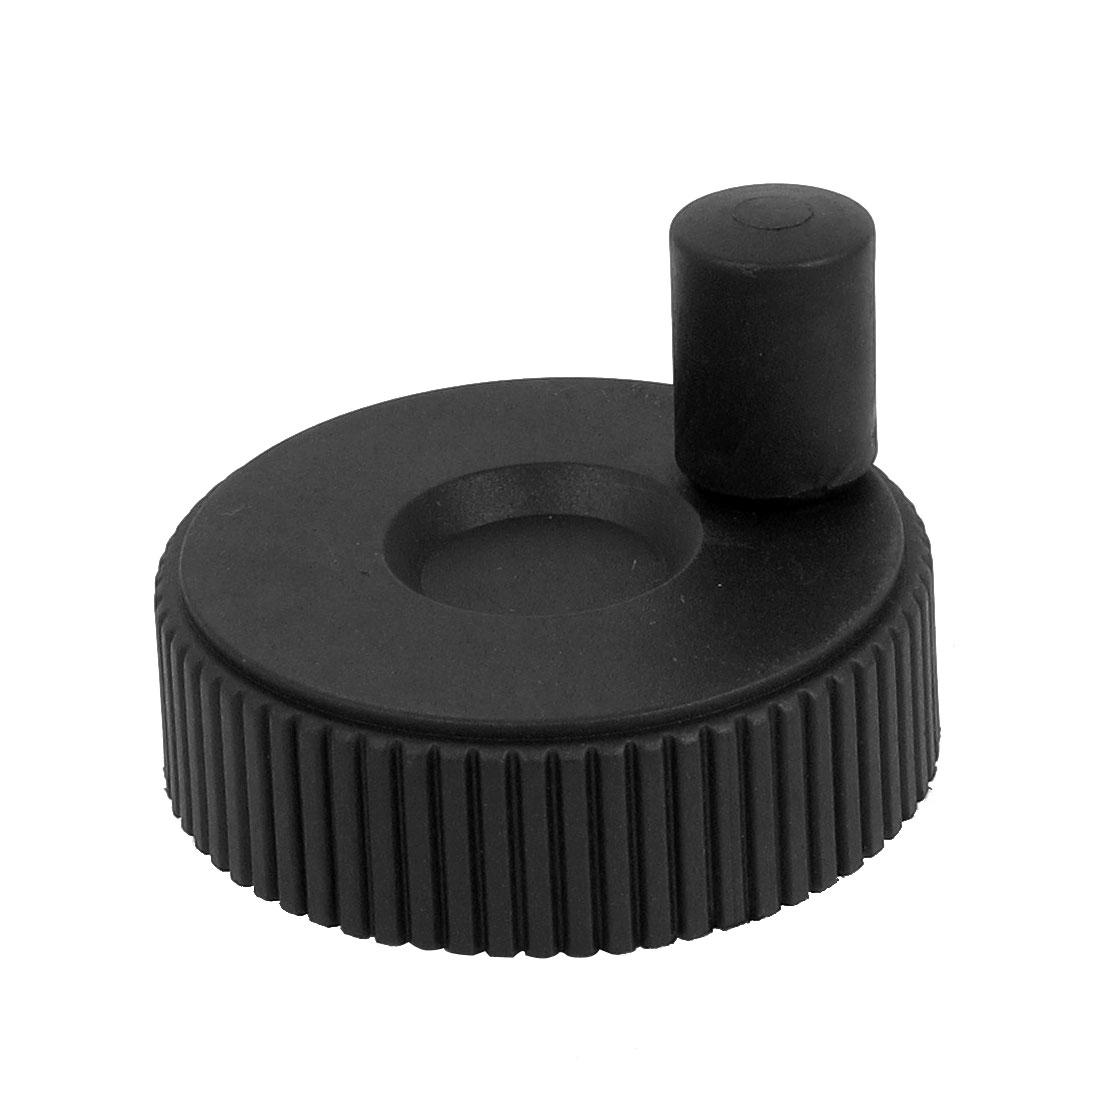 8mm Bore Dia.Plastic Hand Wheel Revolving Handle Grip Knob Black 62mm Diameter